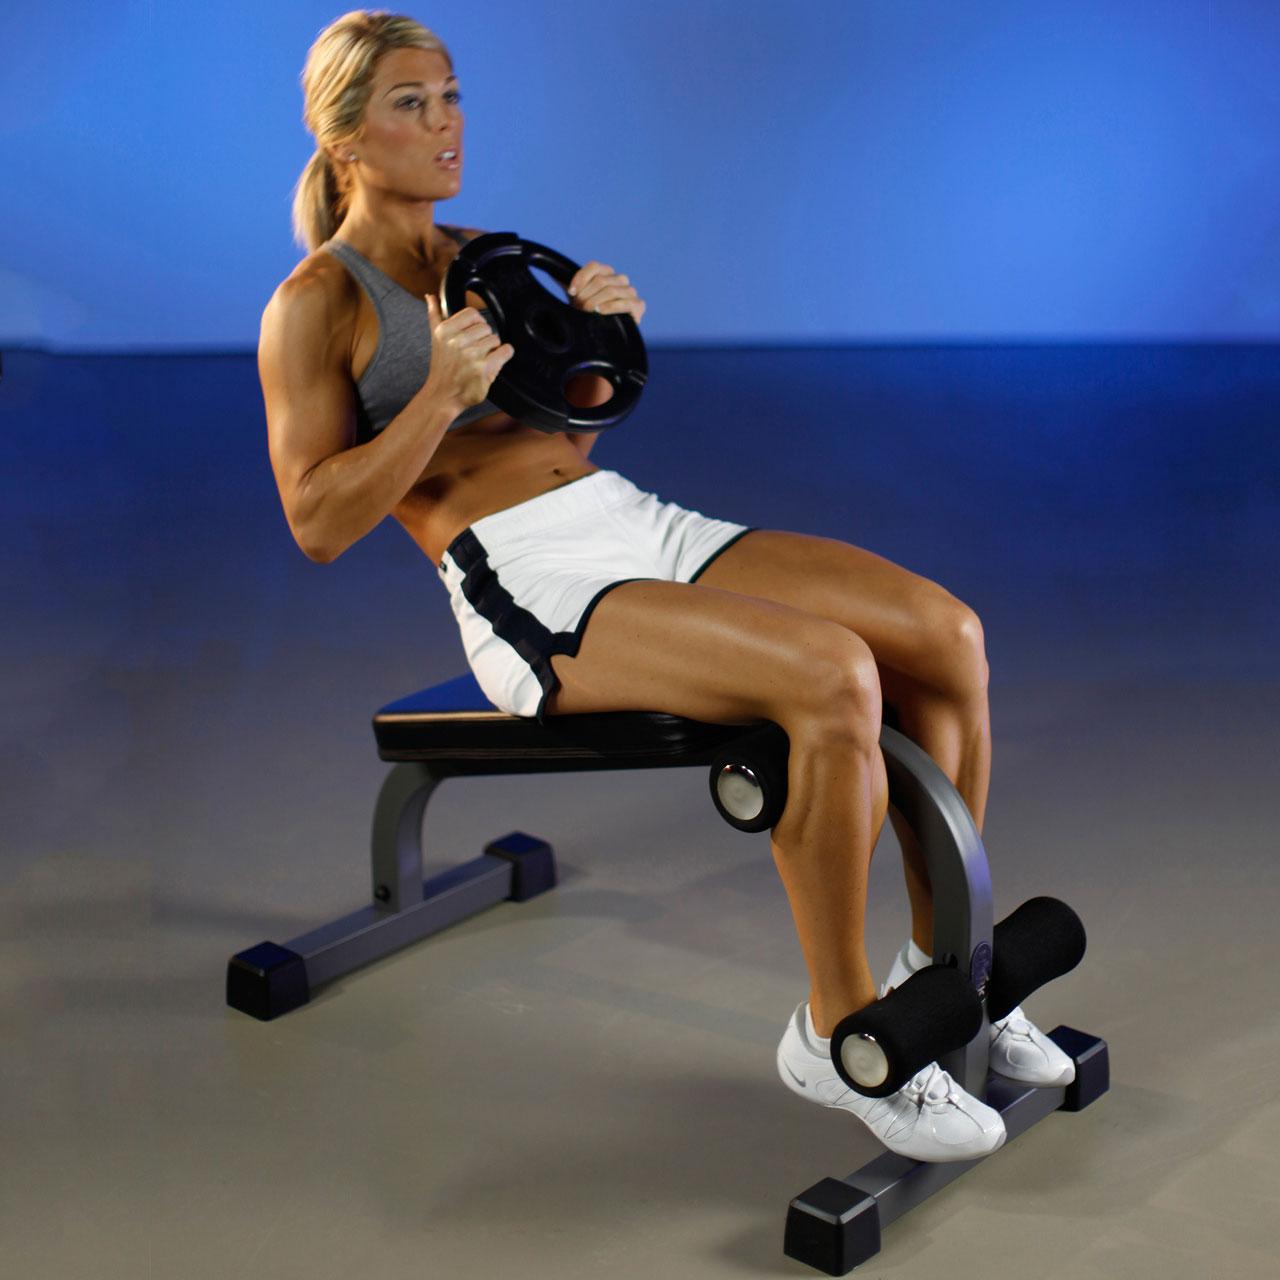 Xmark Fitness Mini Ab Bench Xm 4415 Incredibody